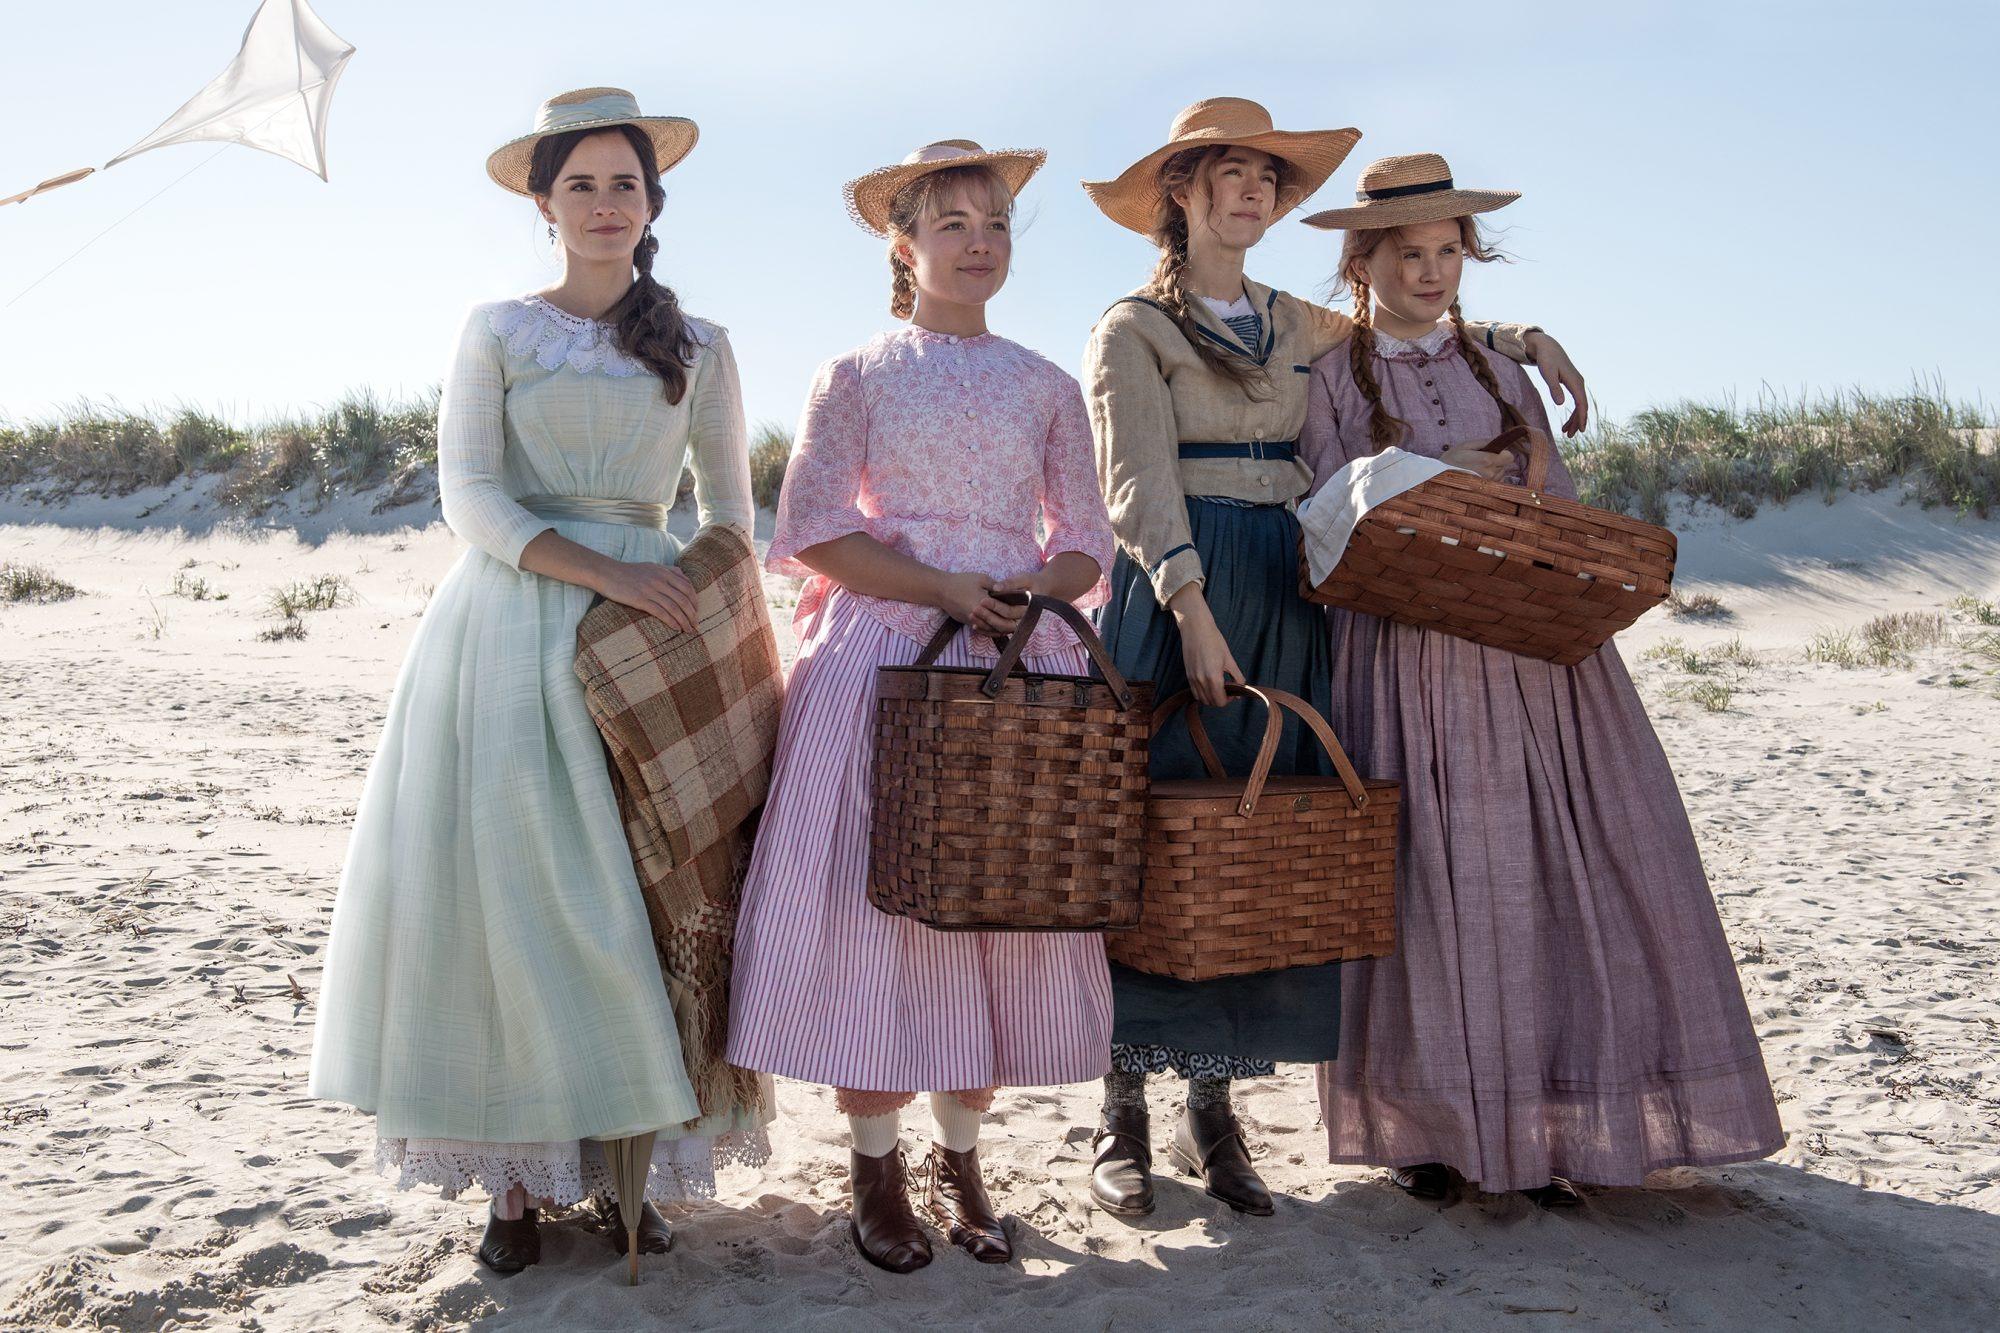 4 chị em nhà March Little Women phong cách cotttagecore